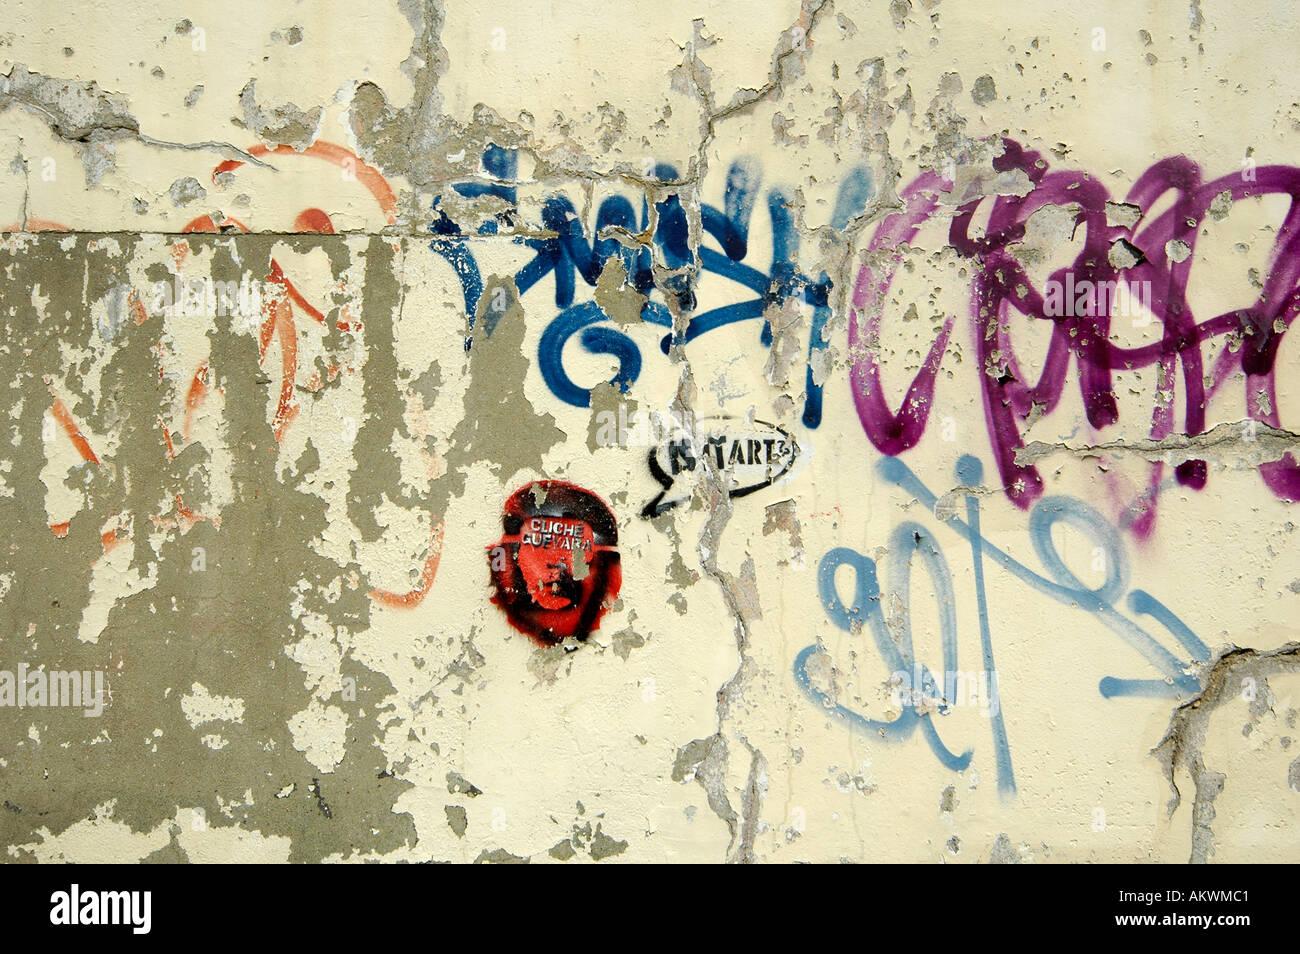 graffiti graffitti on wall texture decay spray paint che guevara logo icon graphic design - Stock Image